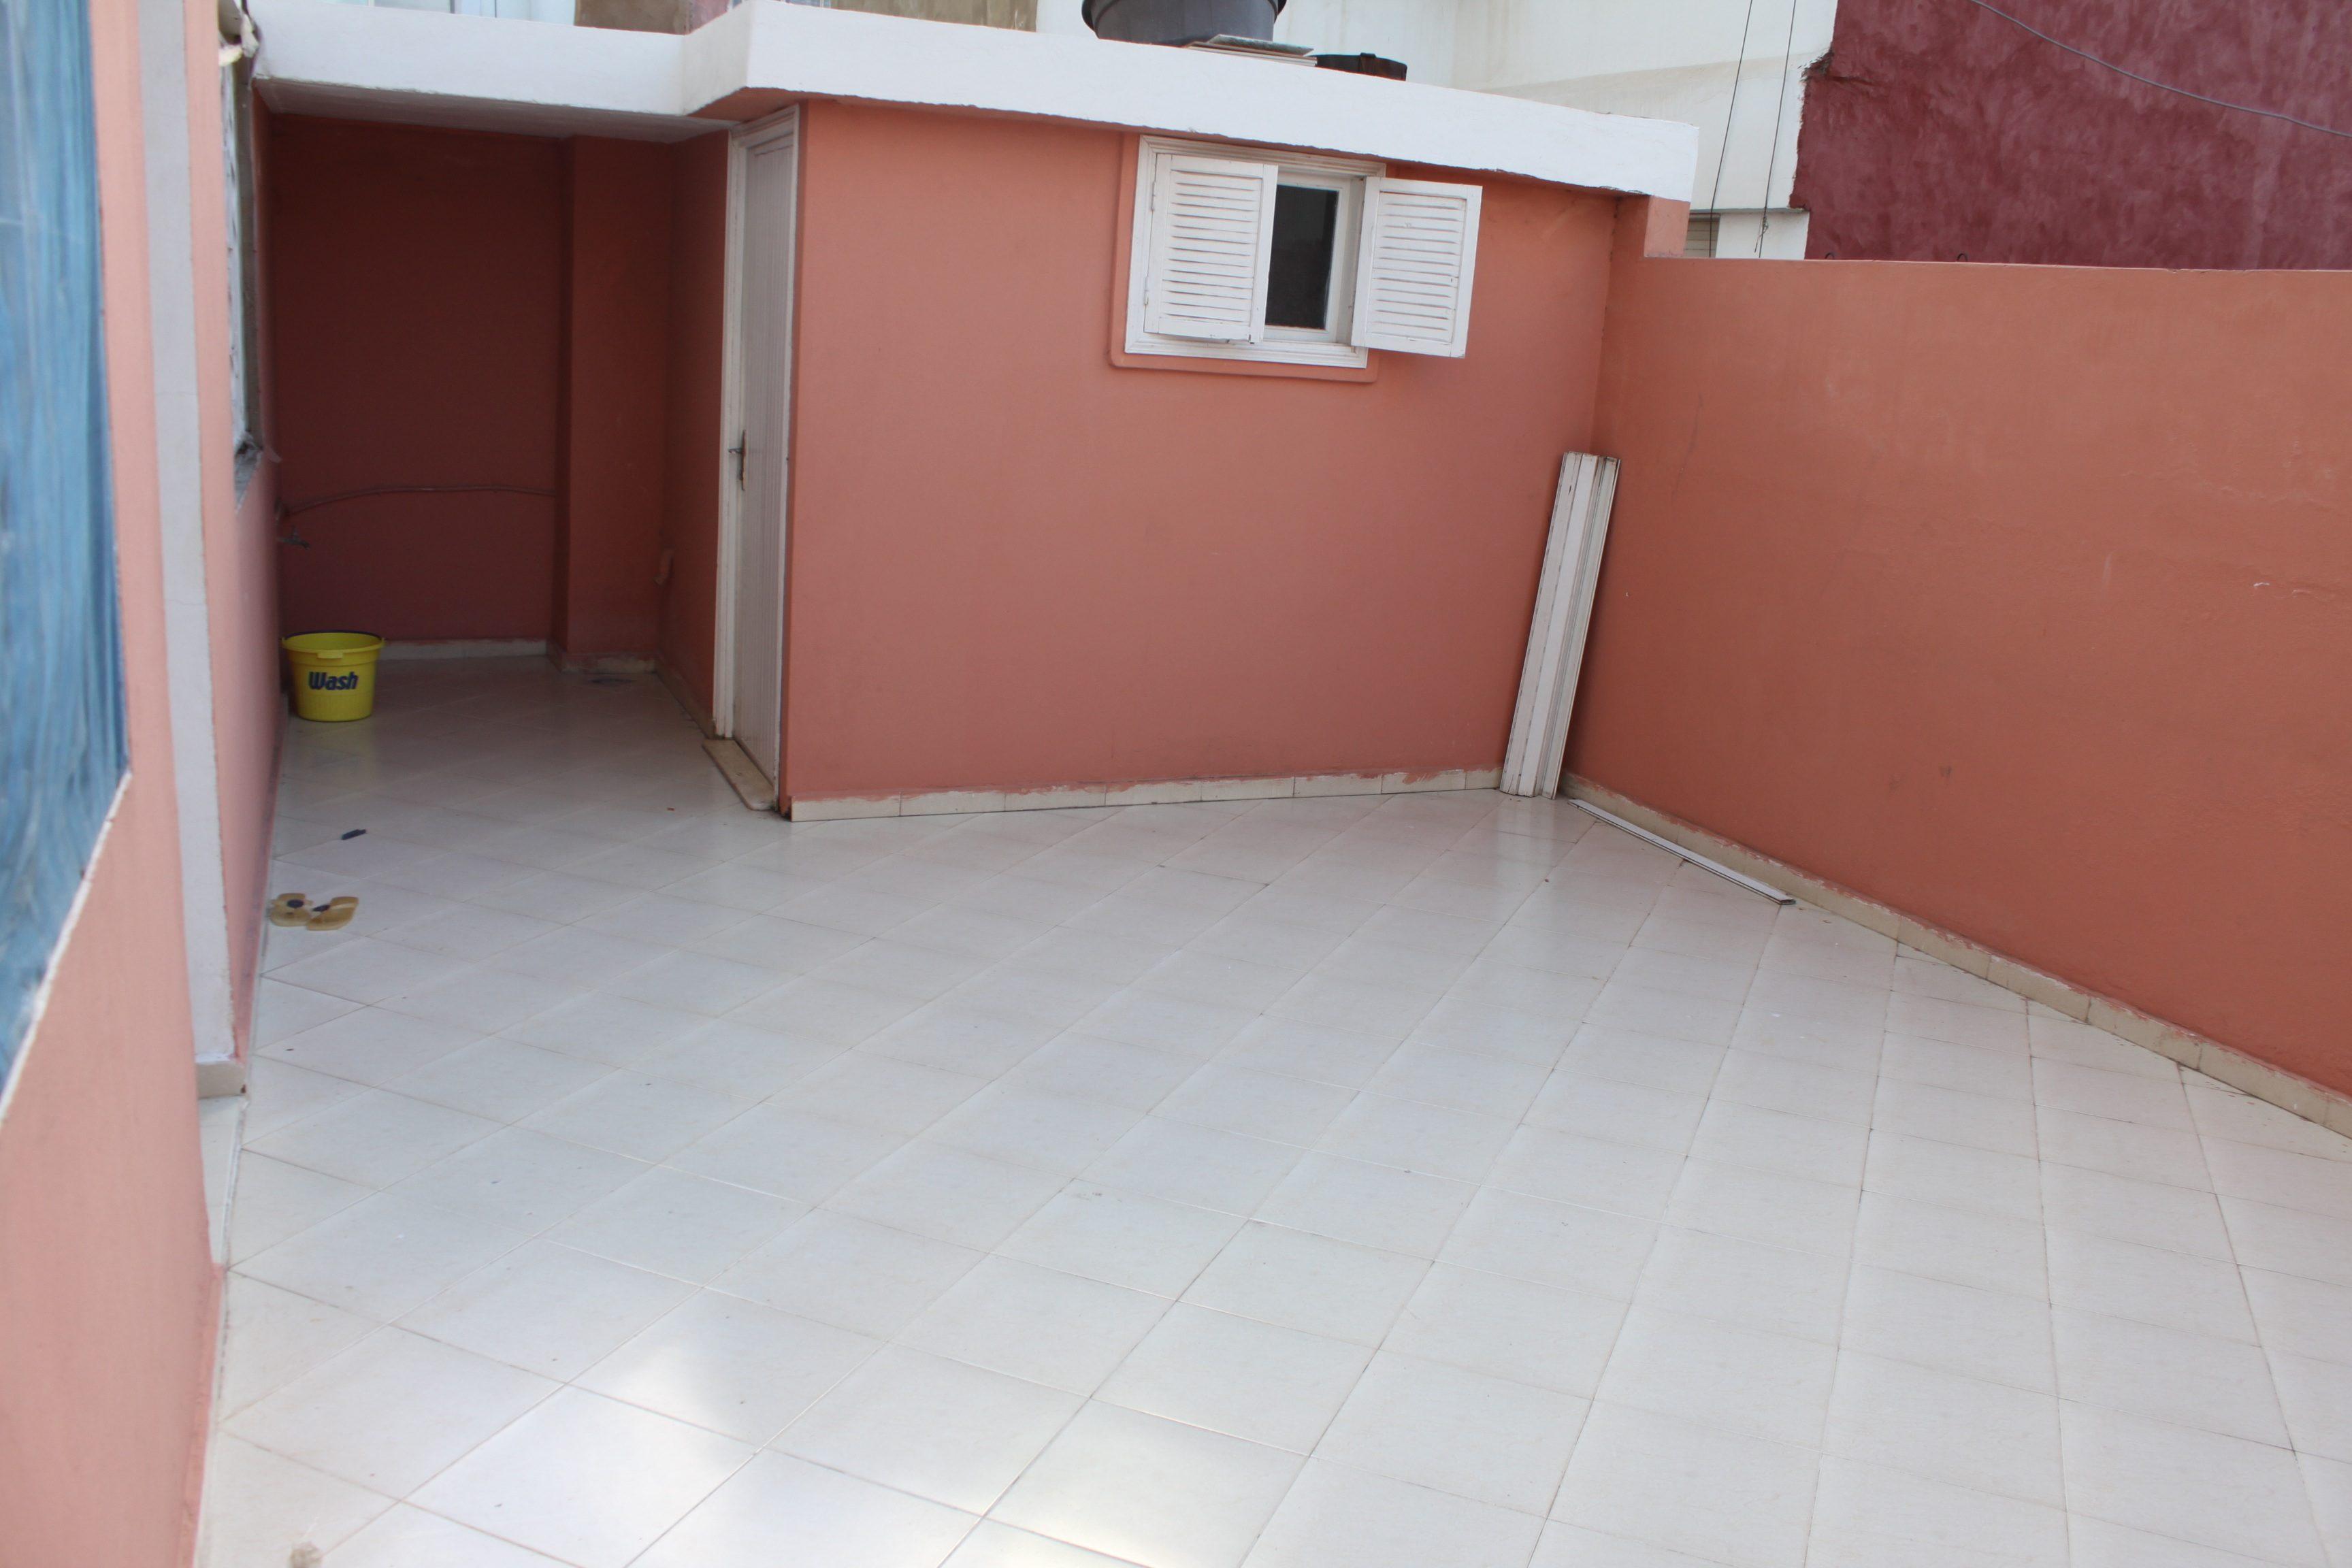 Appartement à vendre à casablanca maroc anfa place vente ...